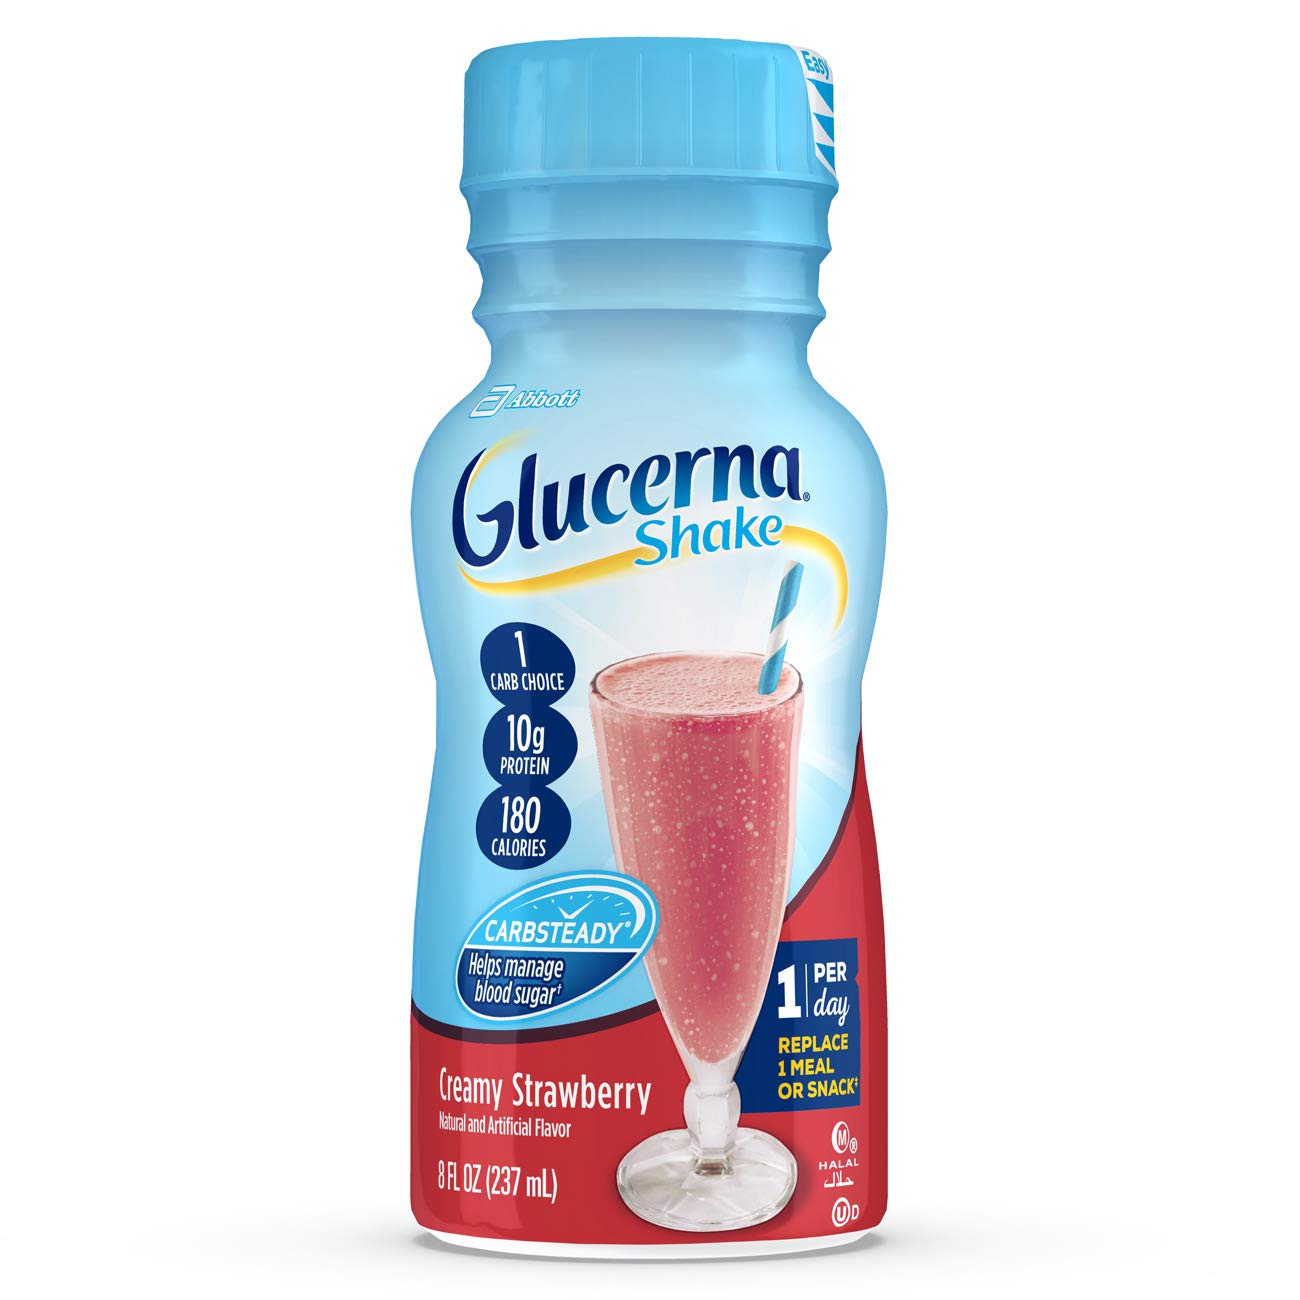 Glucerna Shake, To Help Manage Blood Sugar, Creamy Strawberry, 8 fl oz,